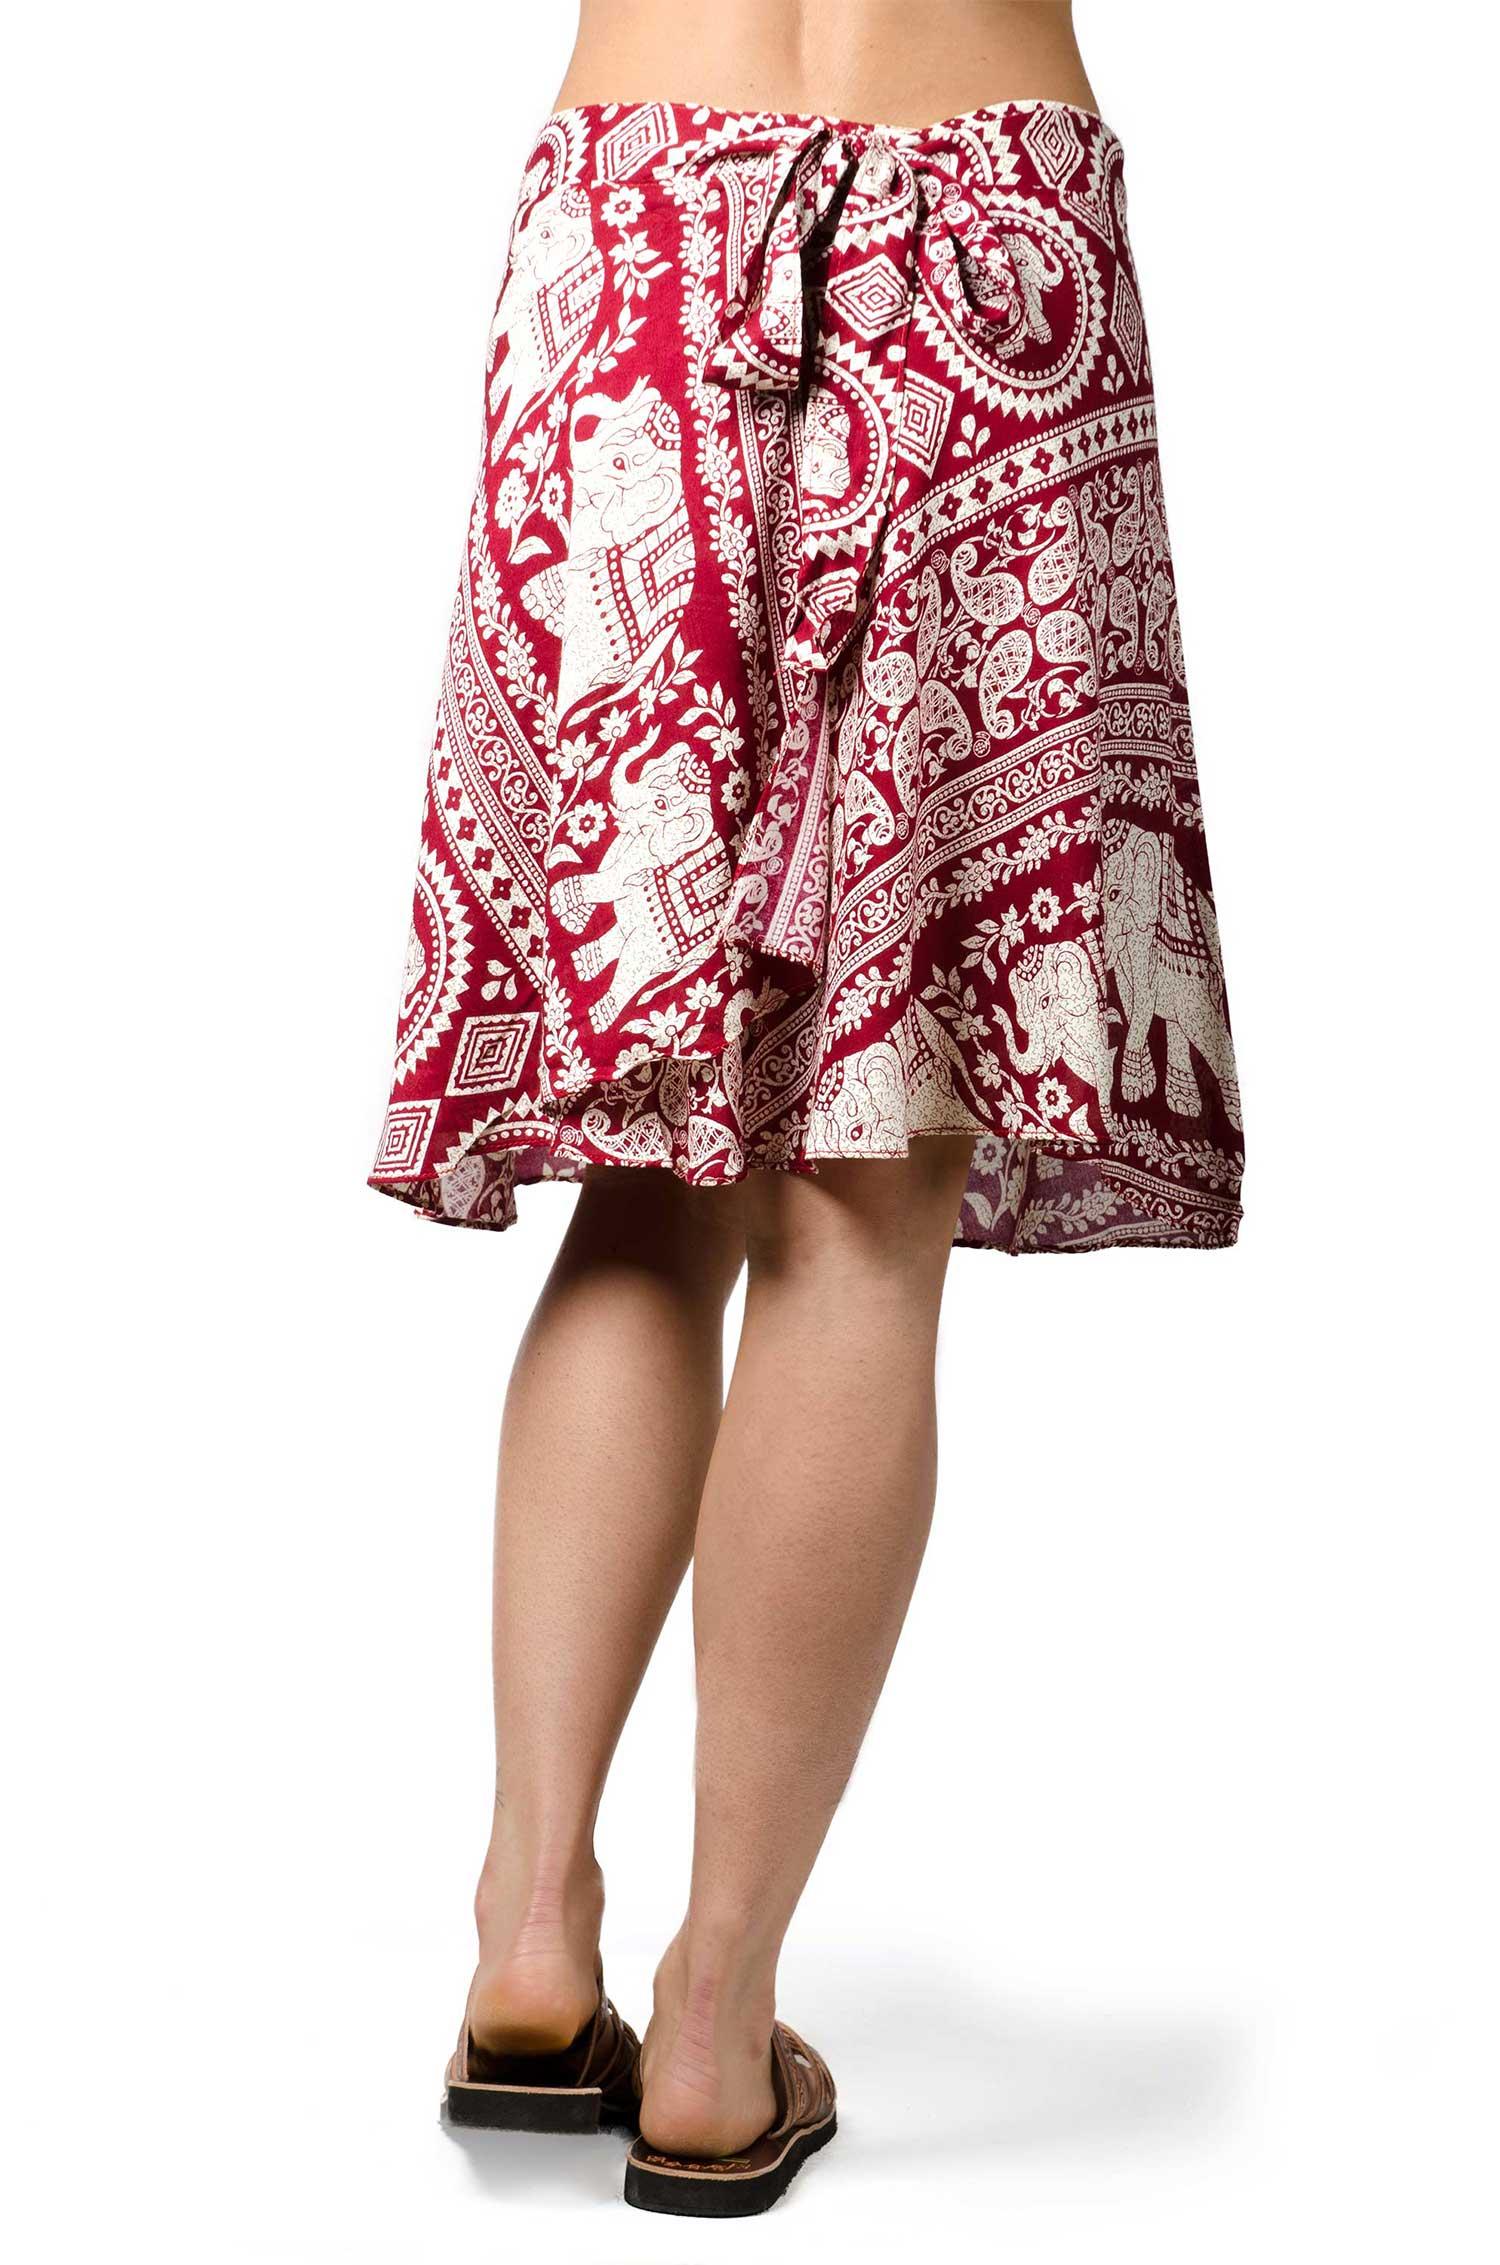 Elephant Print Short Wrap Skirt Teal 3289T